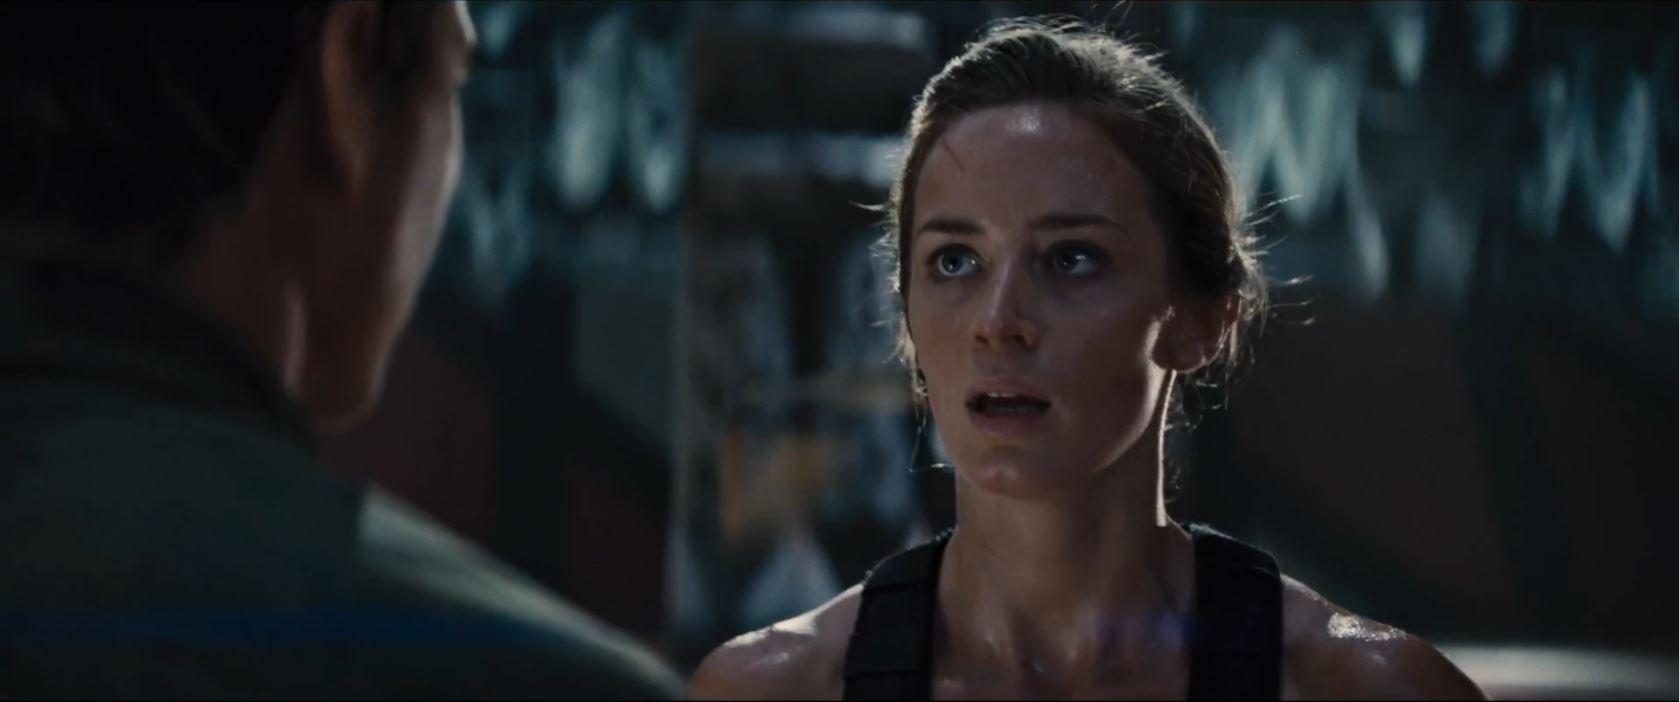 Emily Blunt as Rita Vrataski in Edge of Tomorrow